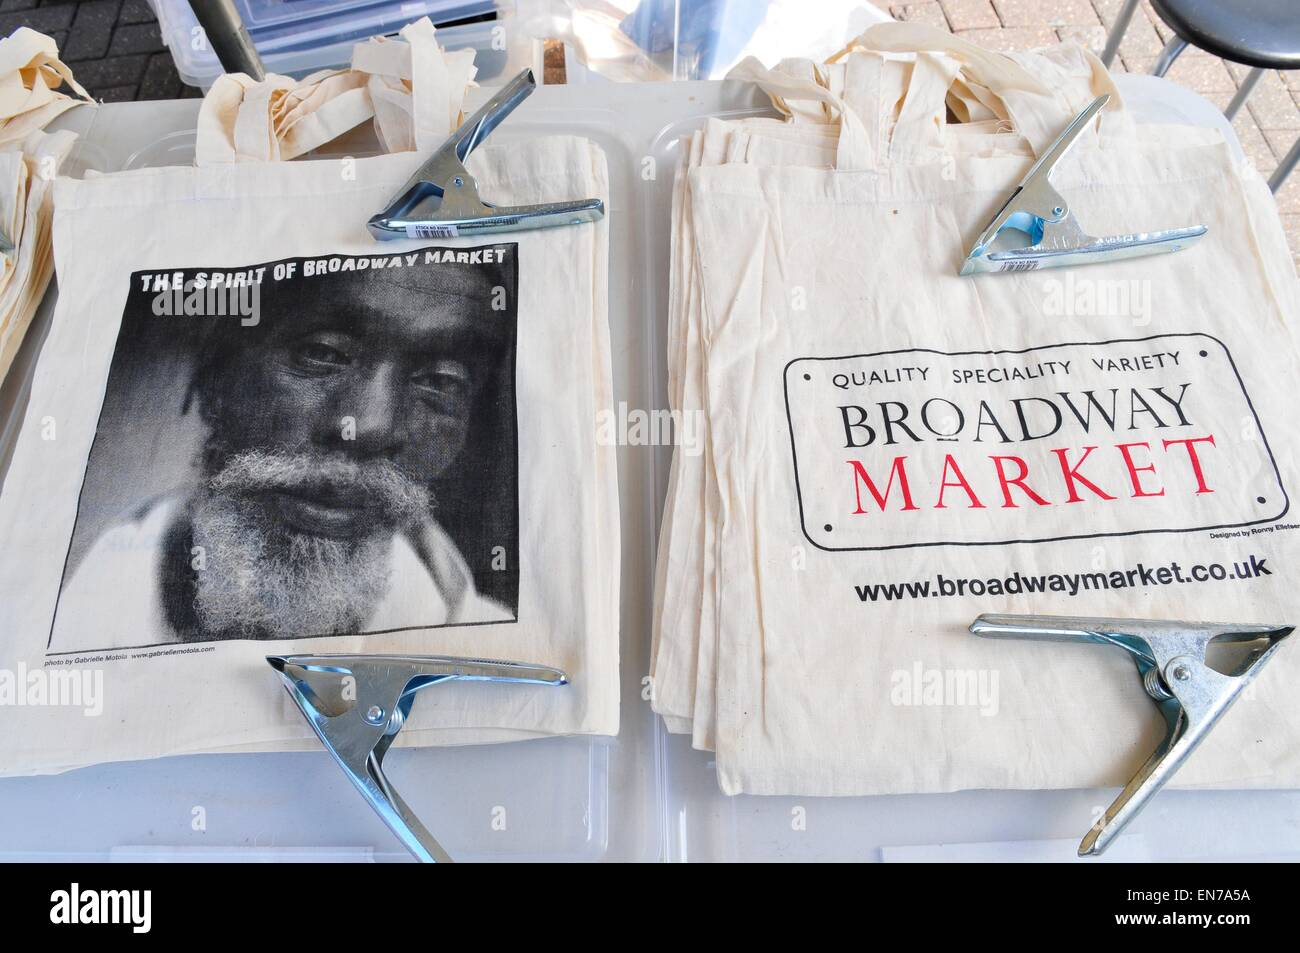 Hessian Bags in Broadway Market, London, England, UK - Stock Image